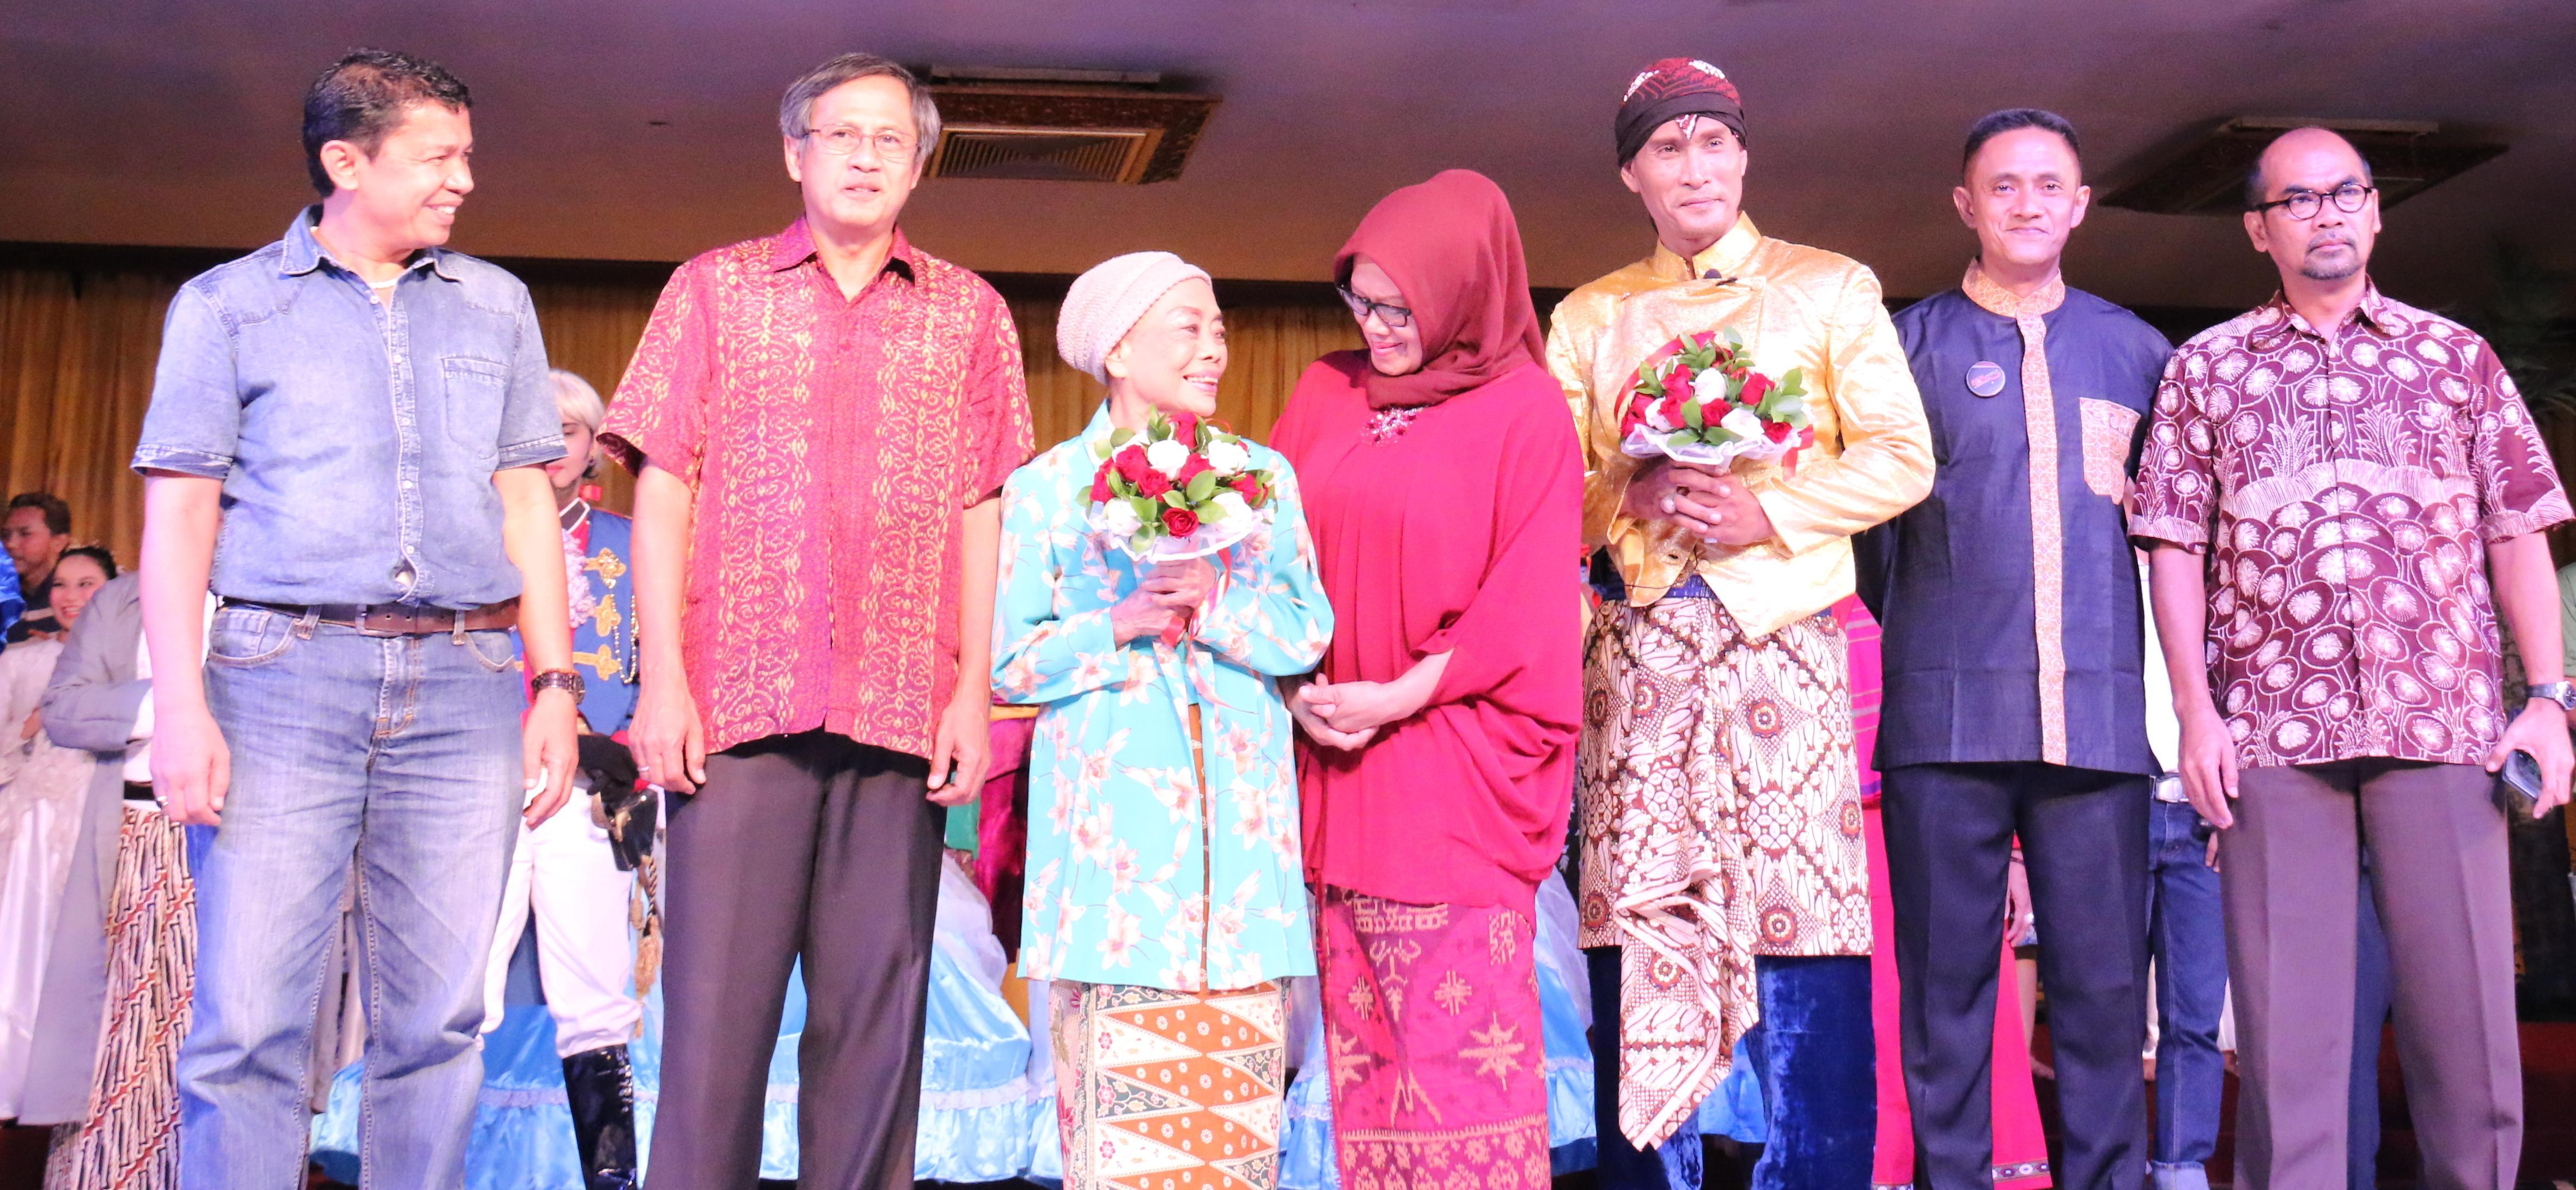 Salah satu legenda perlenongan (Mpok Nori) | Sumber: d3jurnalnews.wordpress.com